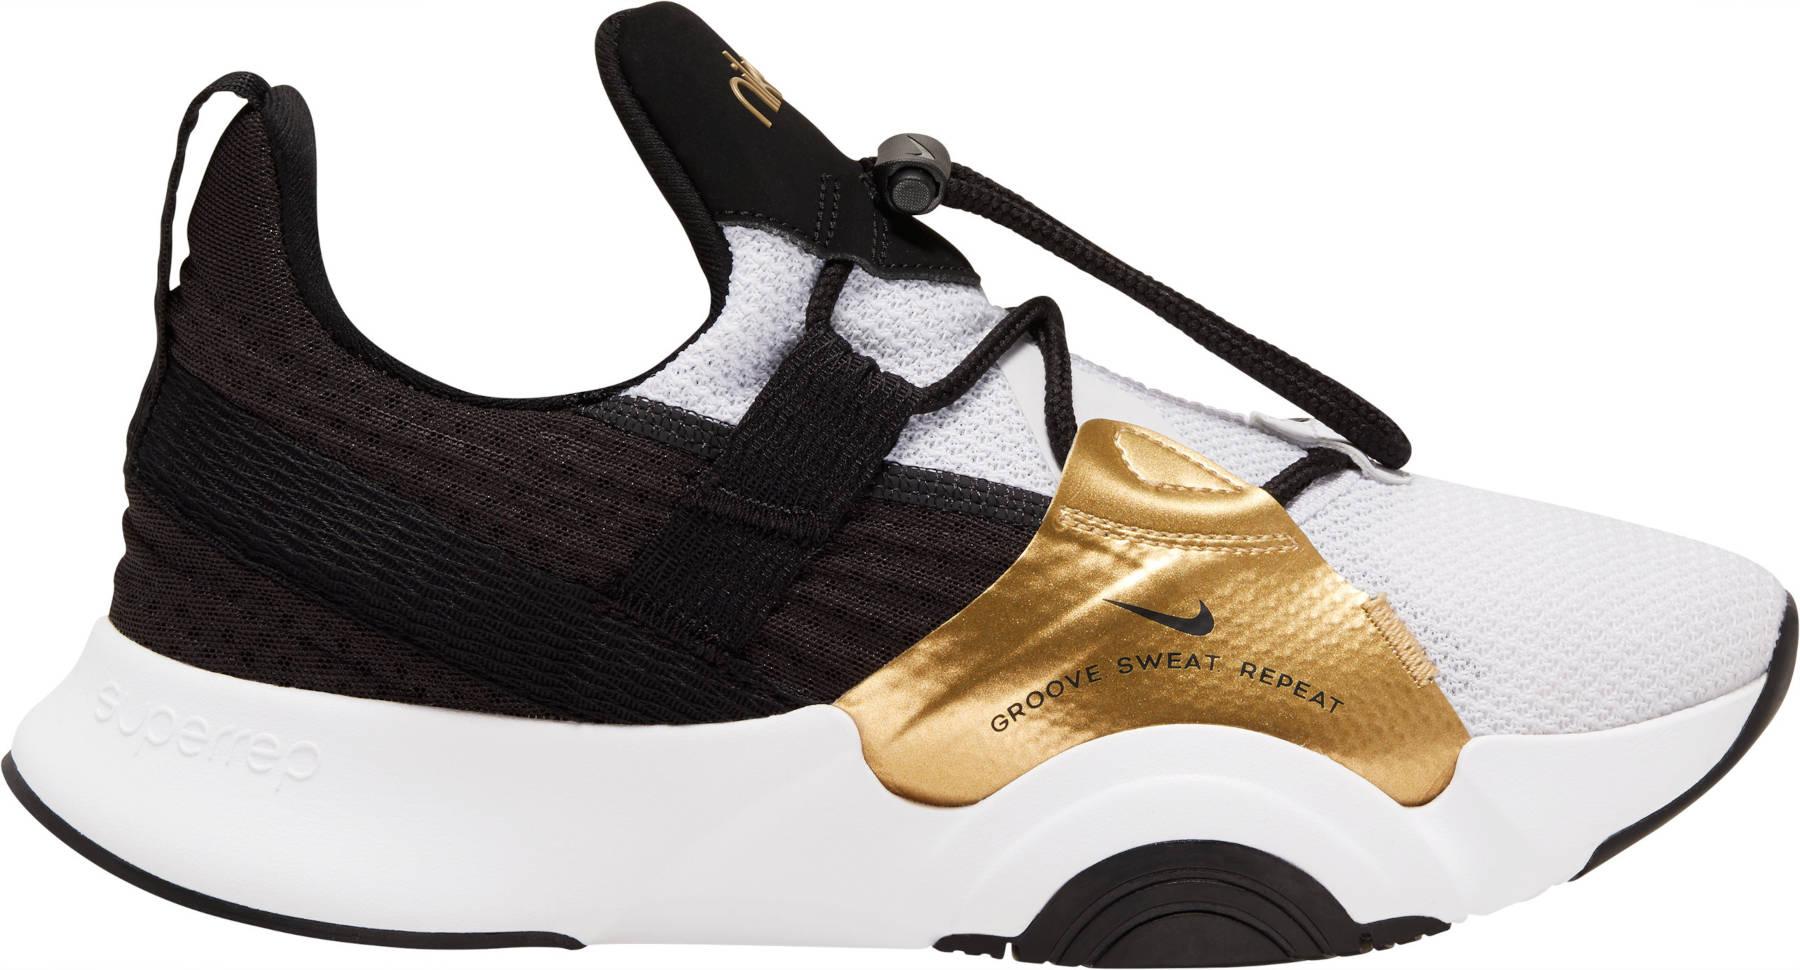 Nike SuperRep Groove Cardio Dance Damenschuh - white/black-metallic gold coin-black CT1248-109